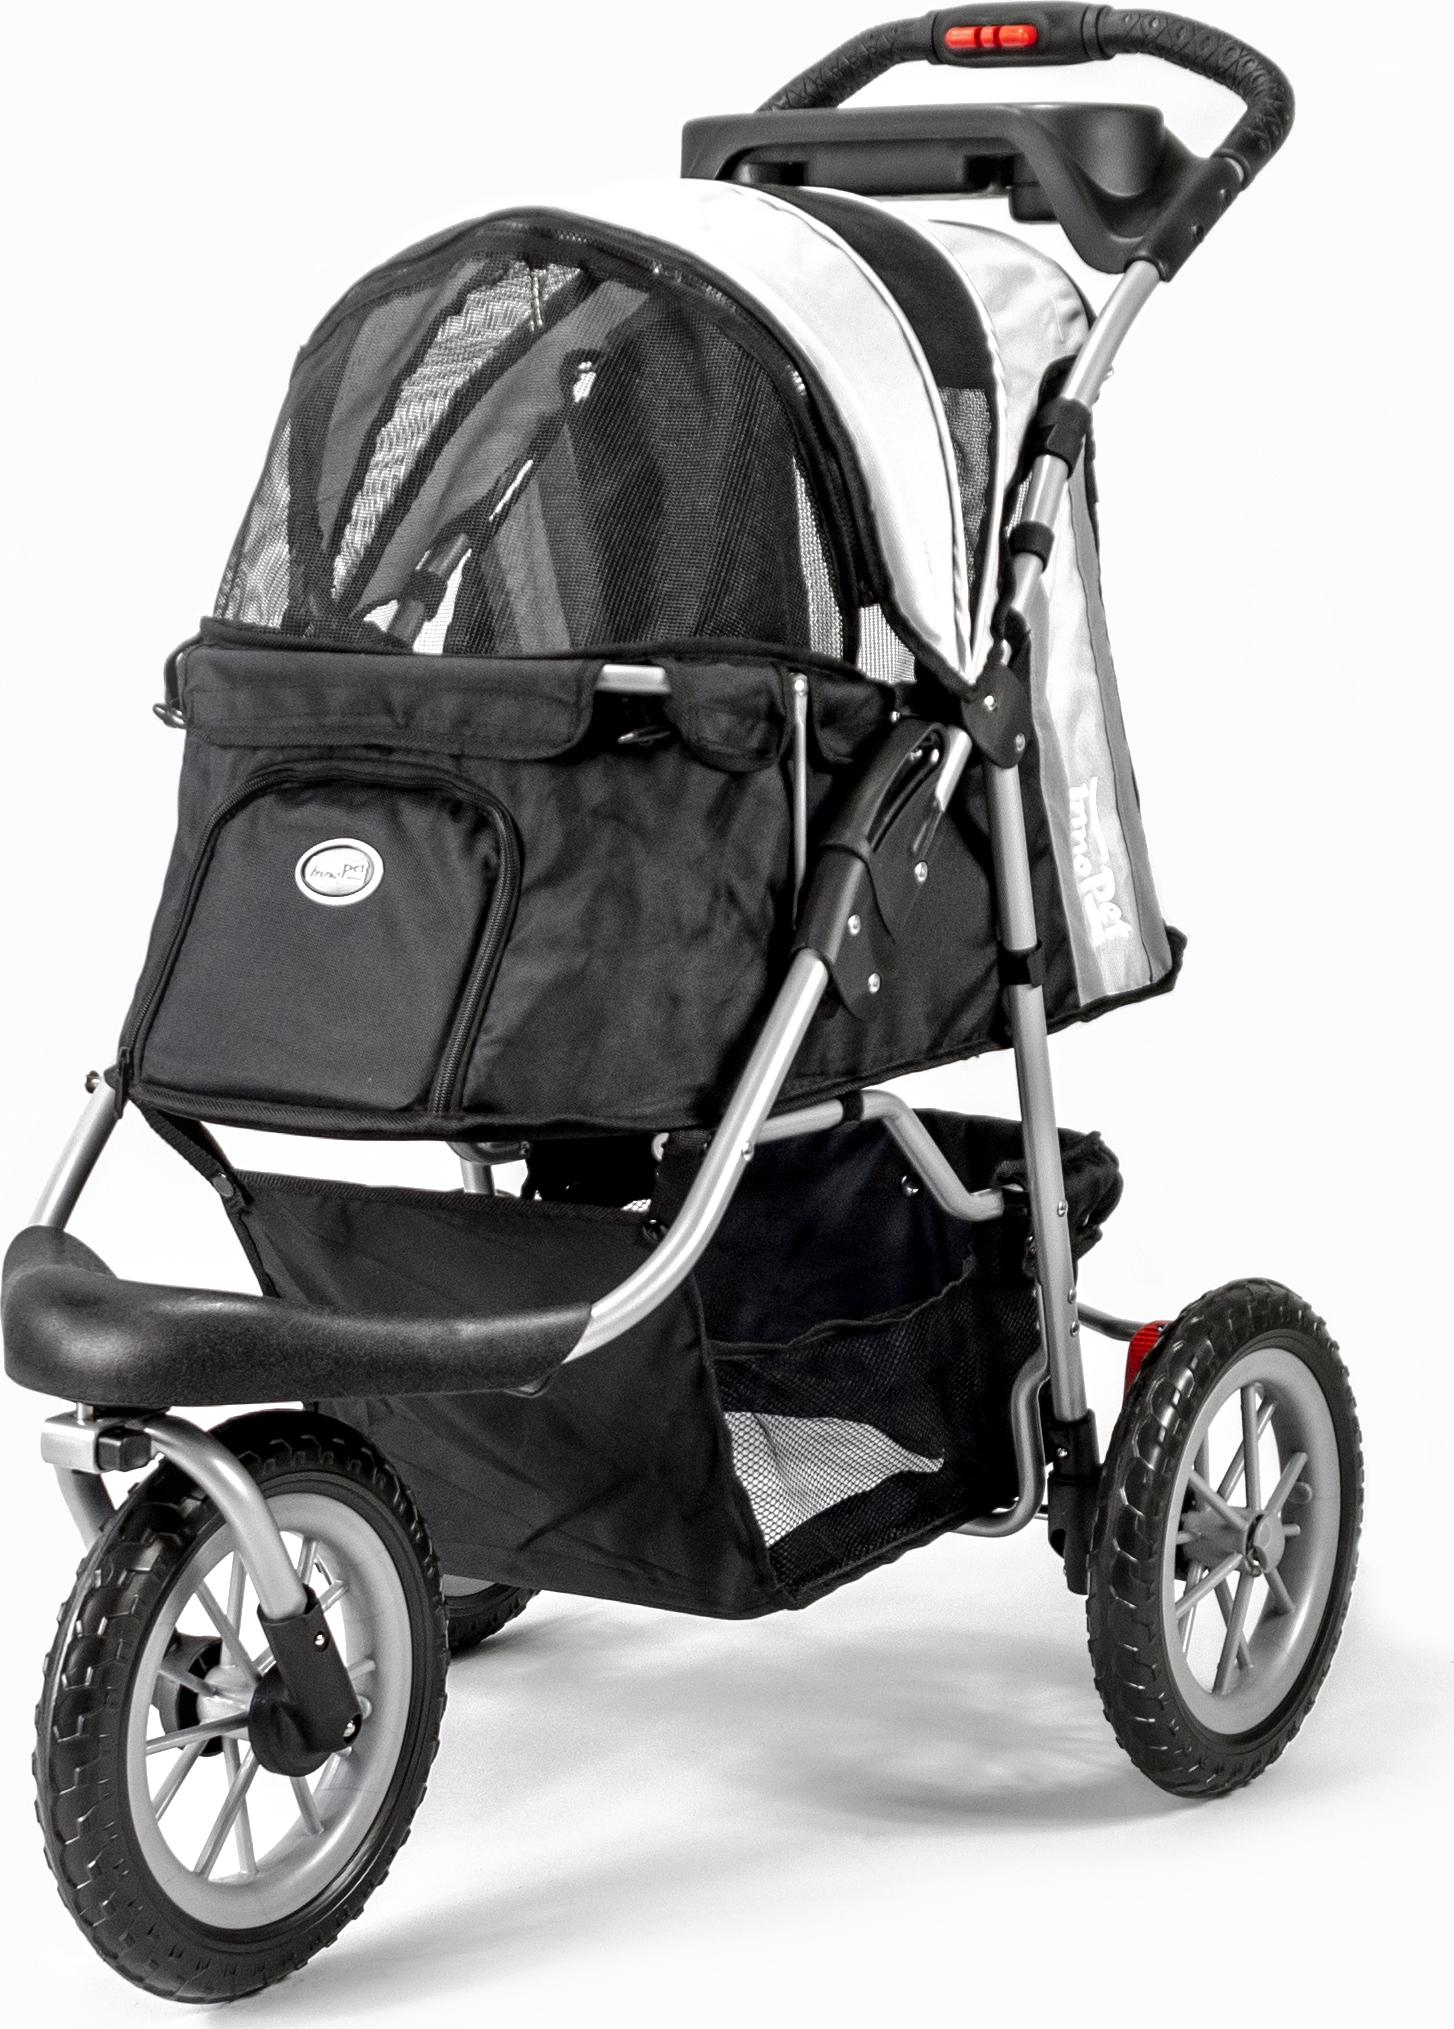 Innopet Hondenbuggy Comfort Efa - Hondentrolley - 46x31x88 cm Zwart Grijs